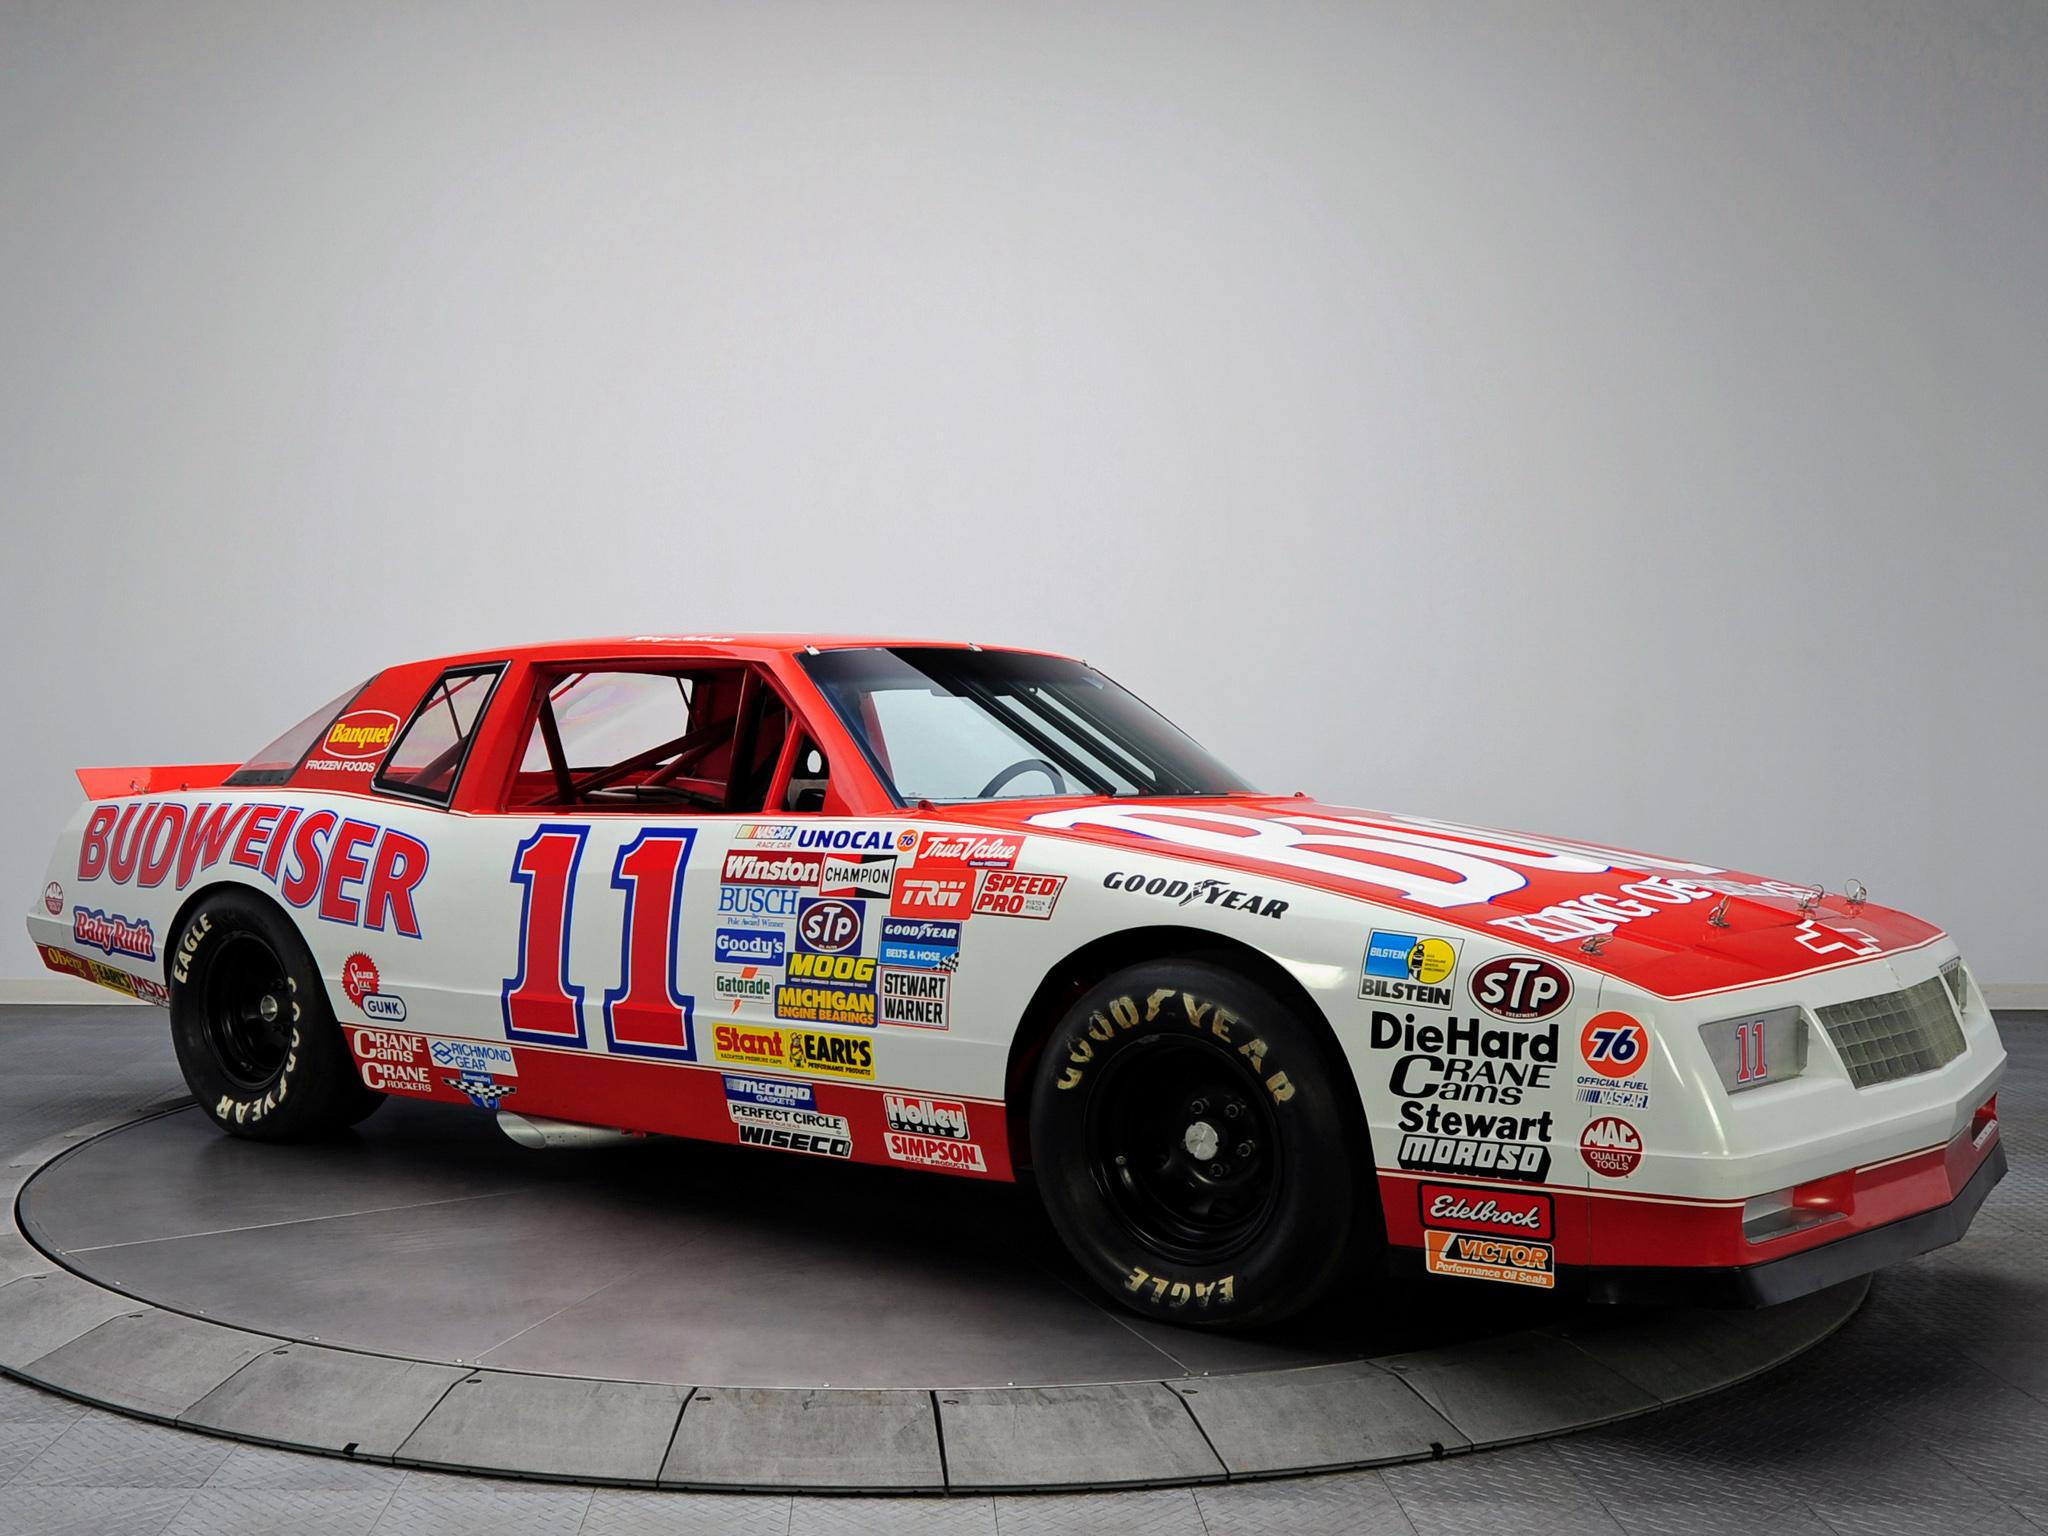 1988 Chevrolet Monte Carlo SS Race Car